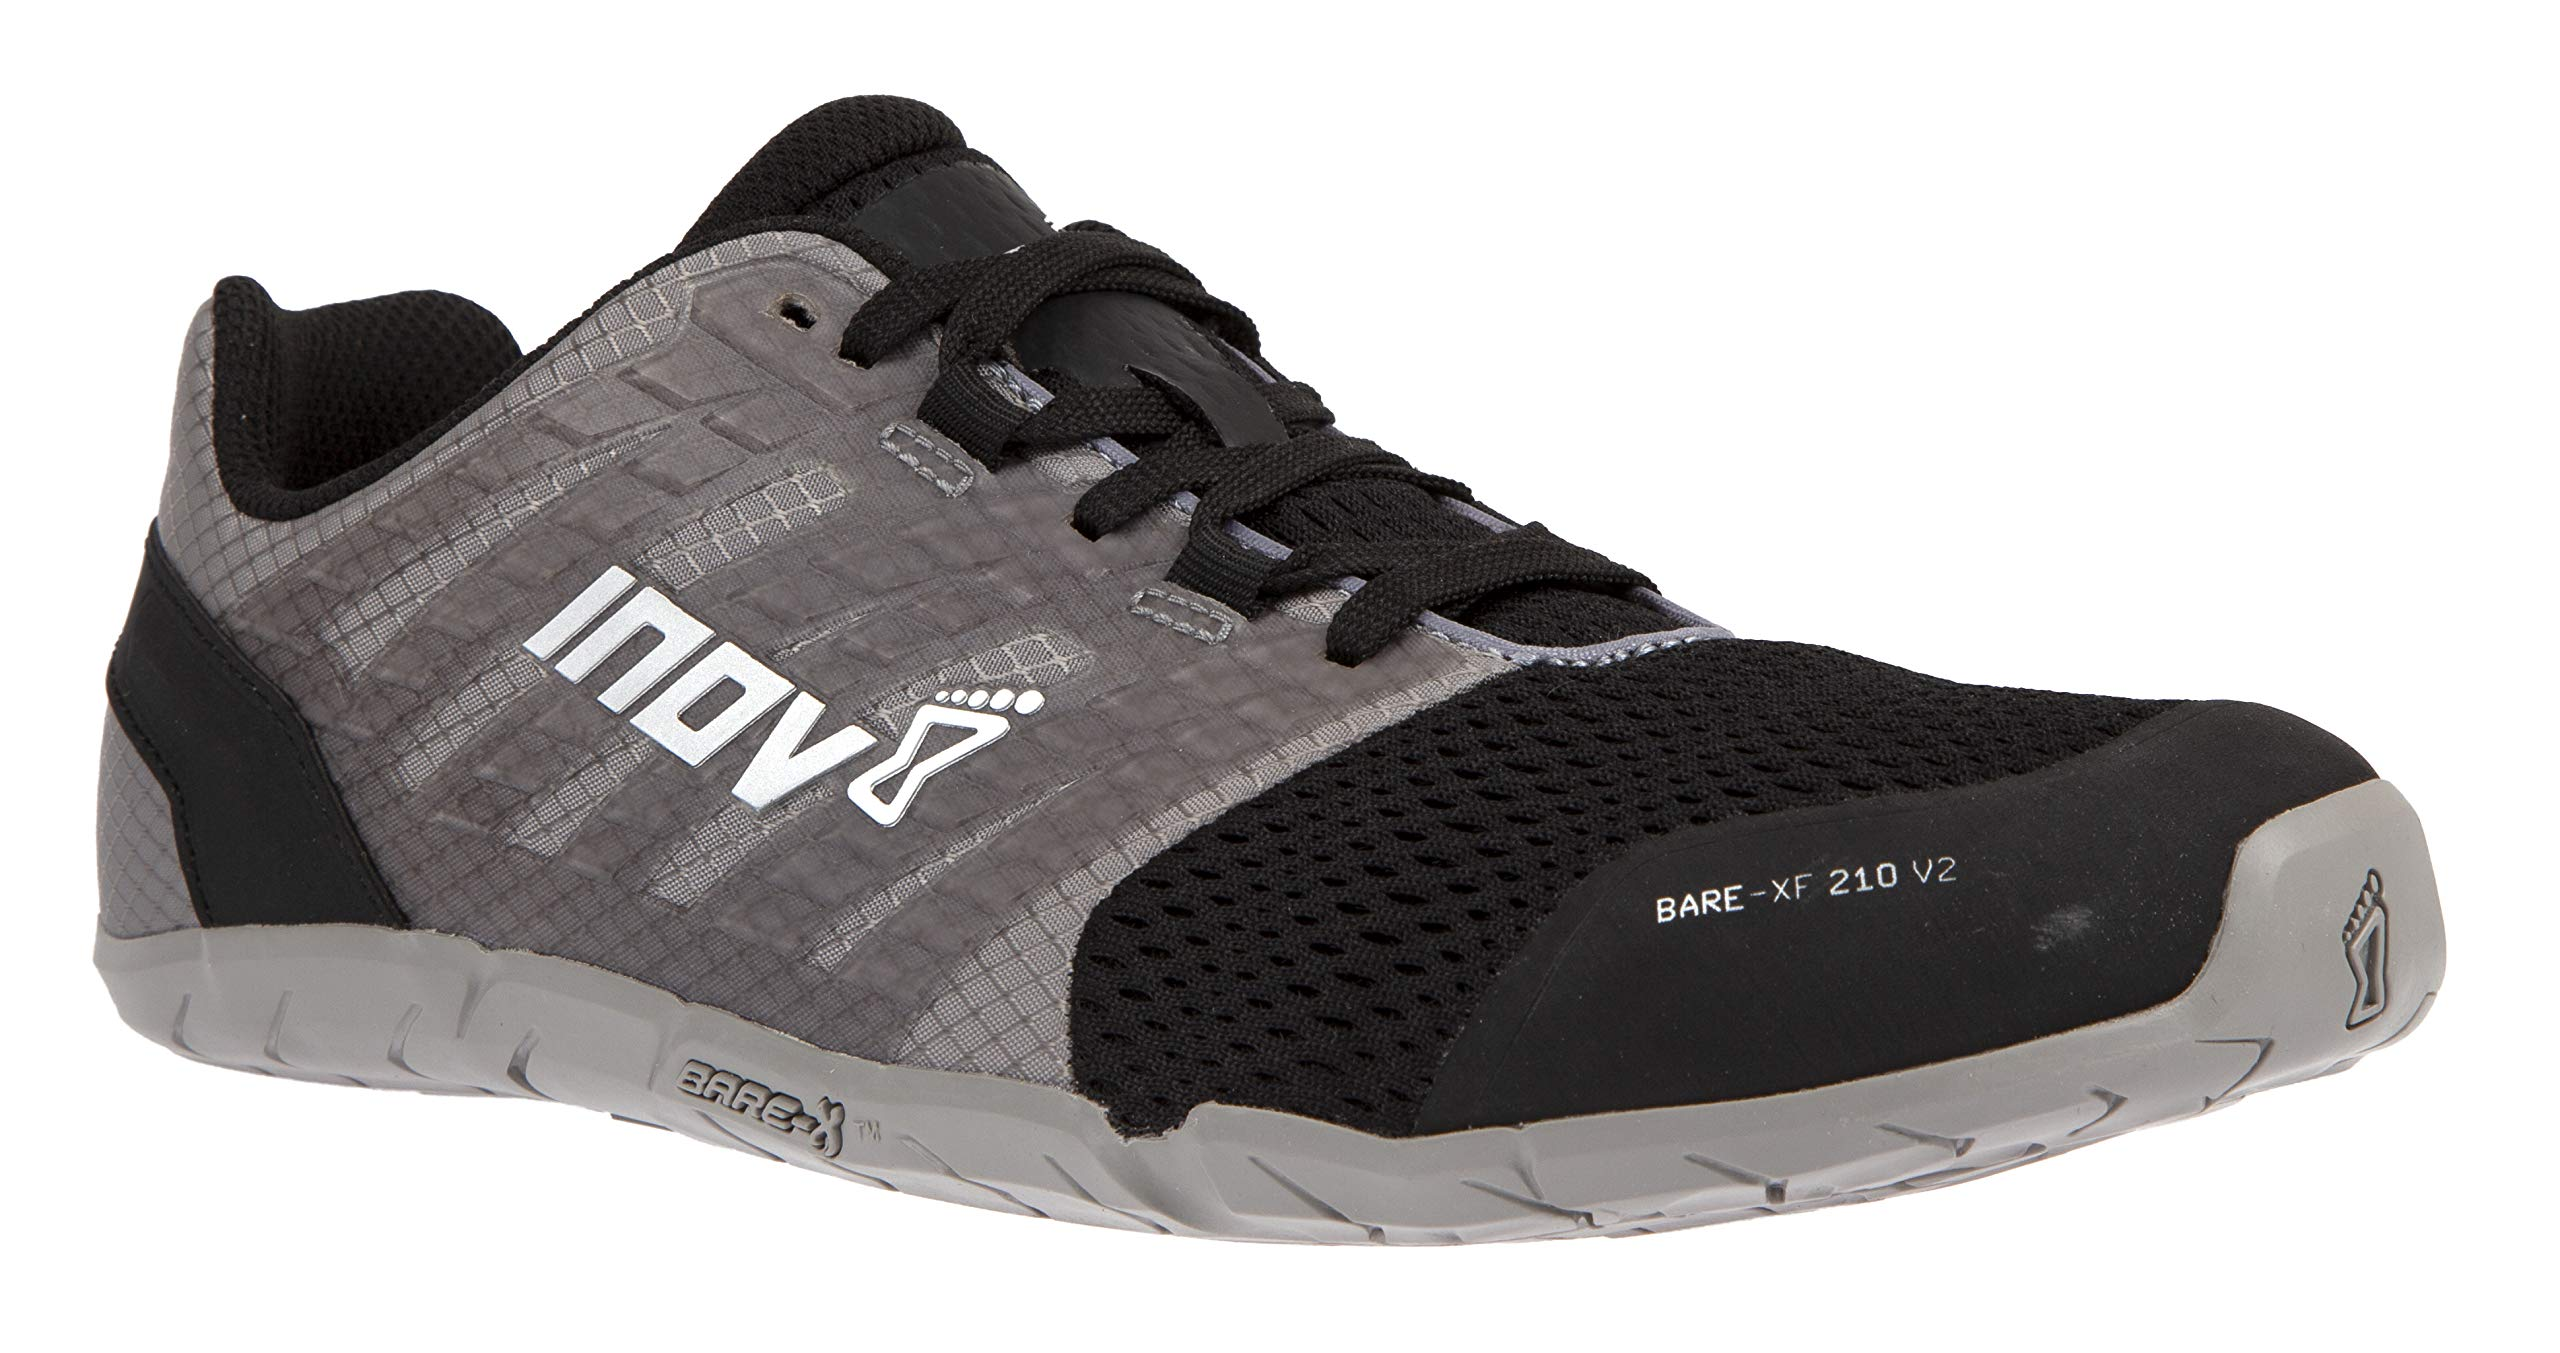 Inov-8 Womens Bare-XF 210 V2 - Barefoot Minimalist Cross Training Shoes - Zero Drop - Wide Toe Box - Versatile Shoe for Powerlifting & Gym - Calisthenics & Martial Arts - Grey/Black 8 W US by Inov-8